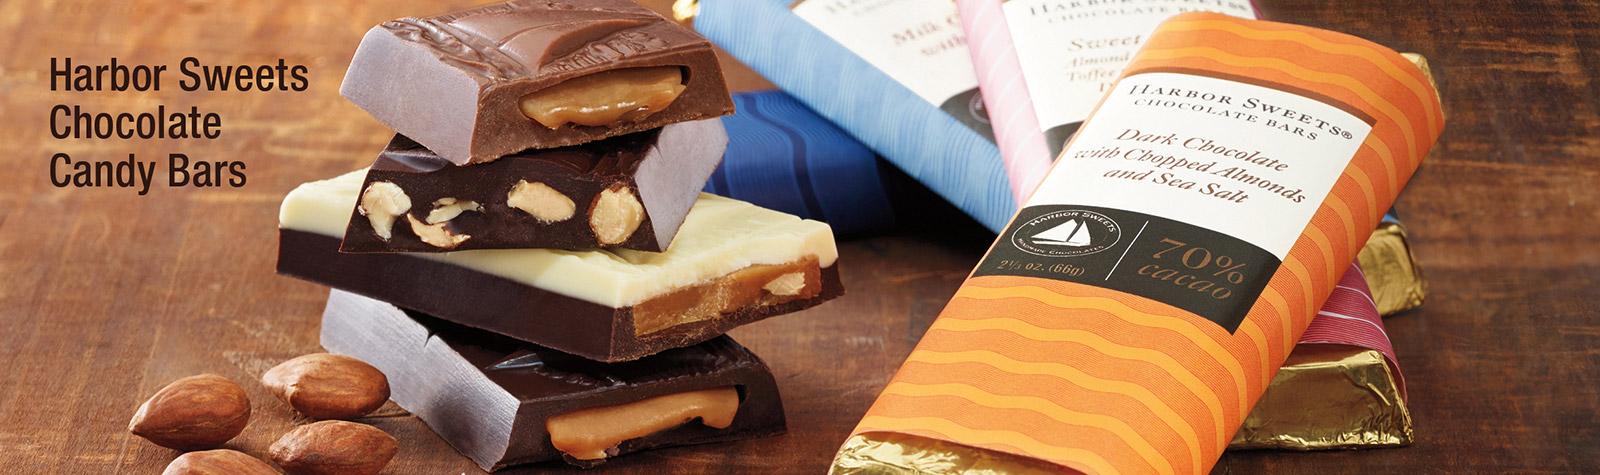 Chocolate Bars - Harbor Sweets